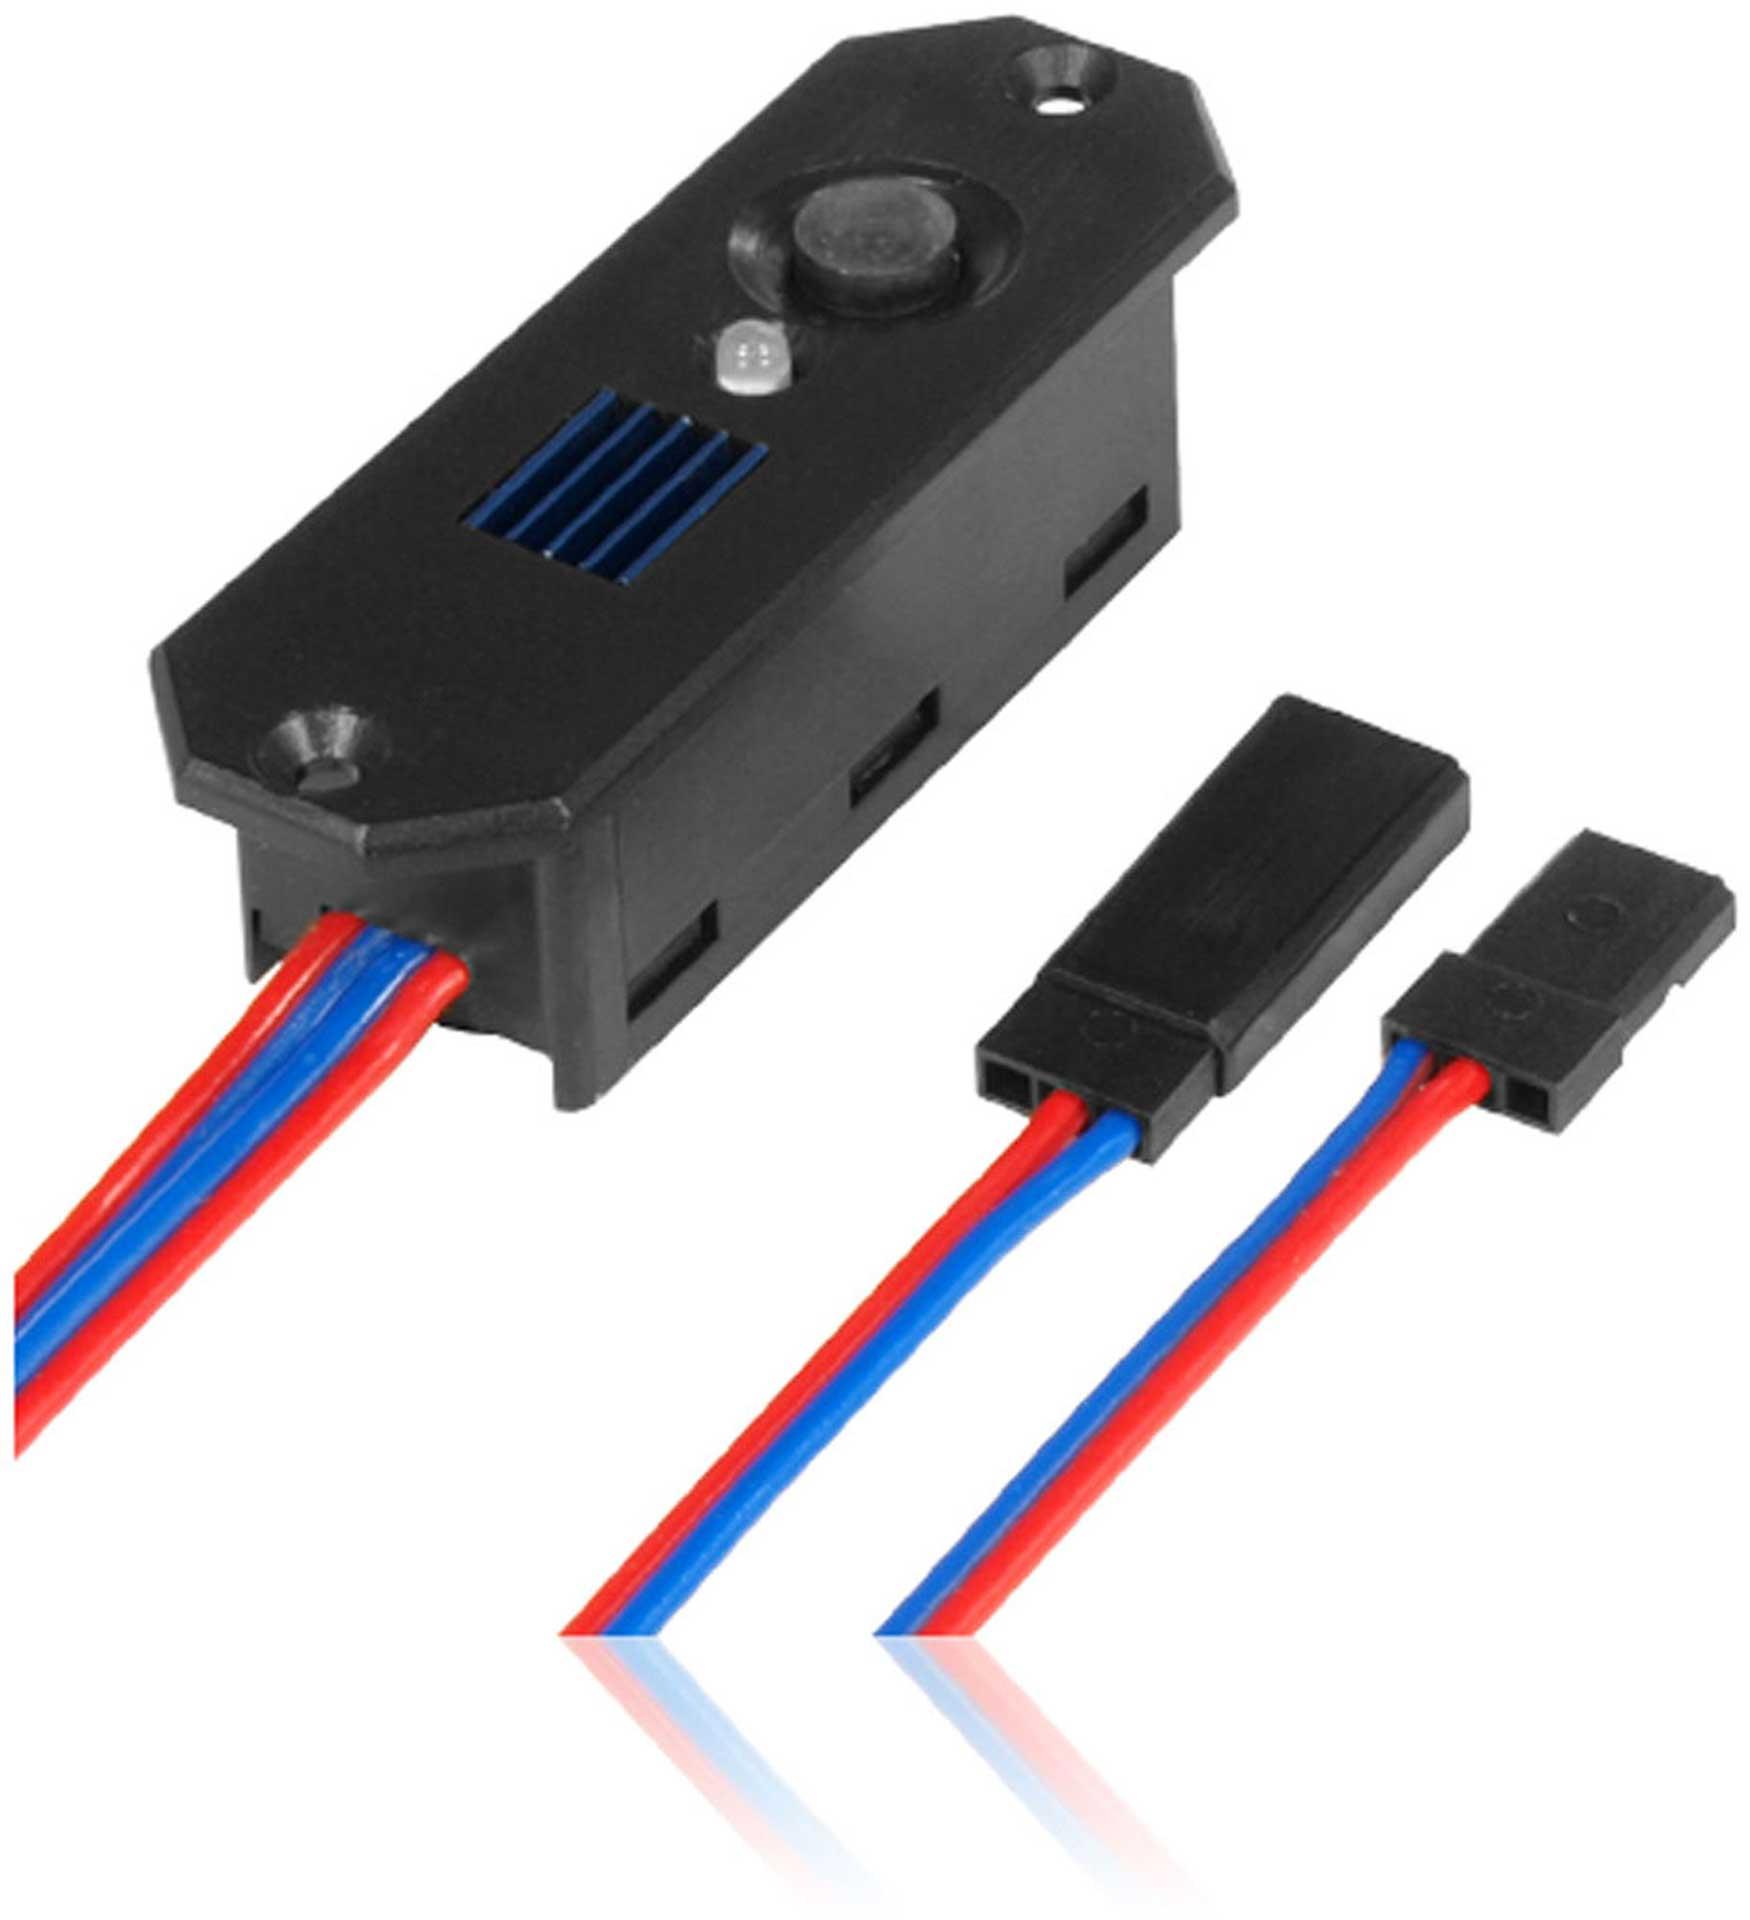 POWERBOX SYSTEMS POWERBOX SMART SWITCH ELEKTRONISCHER